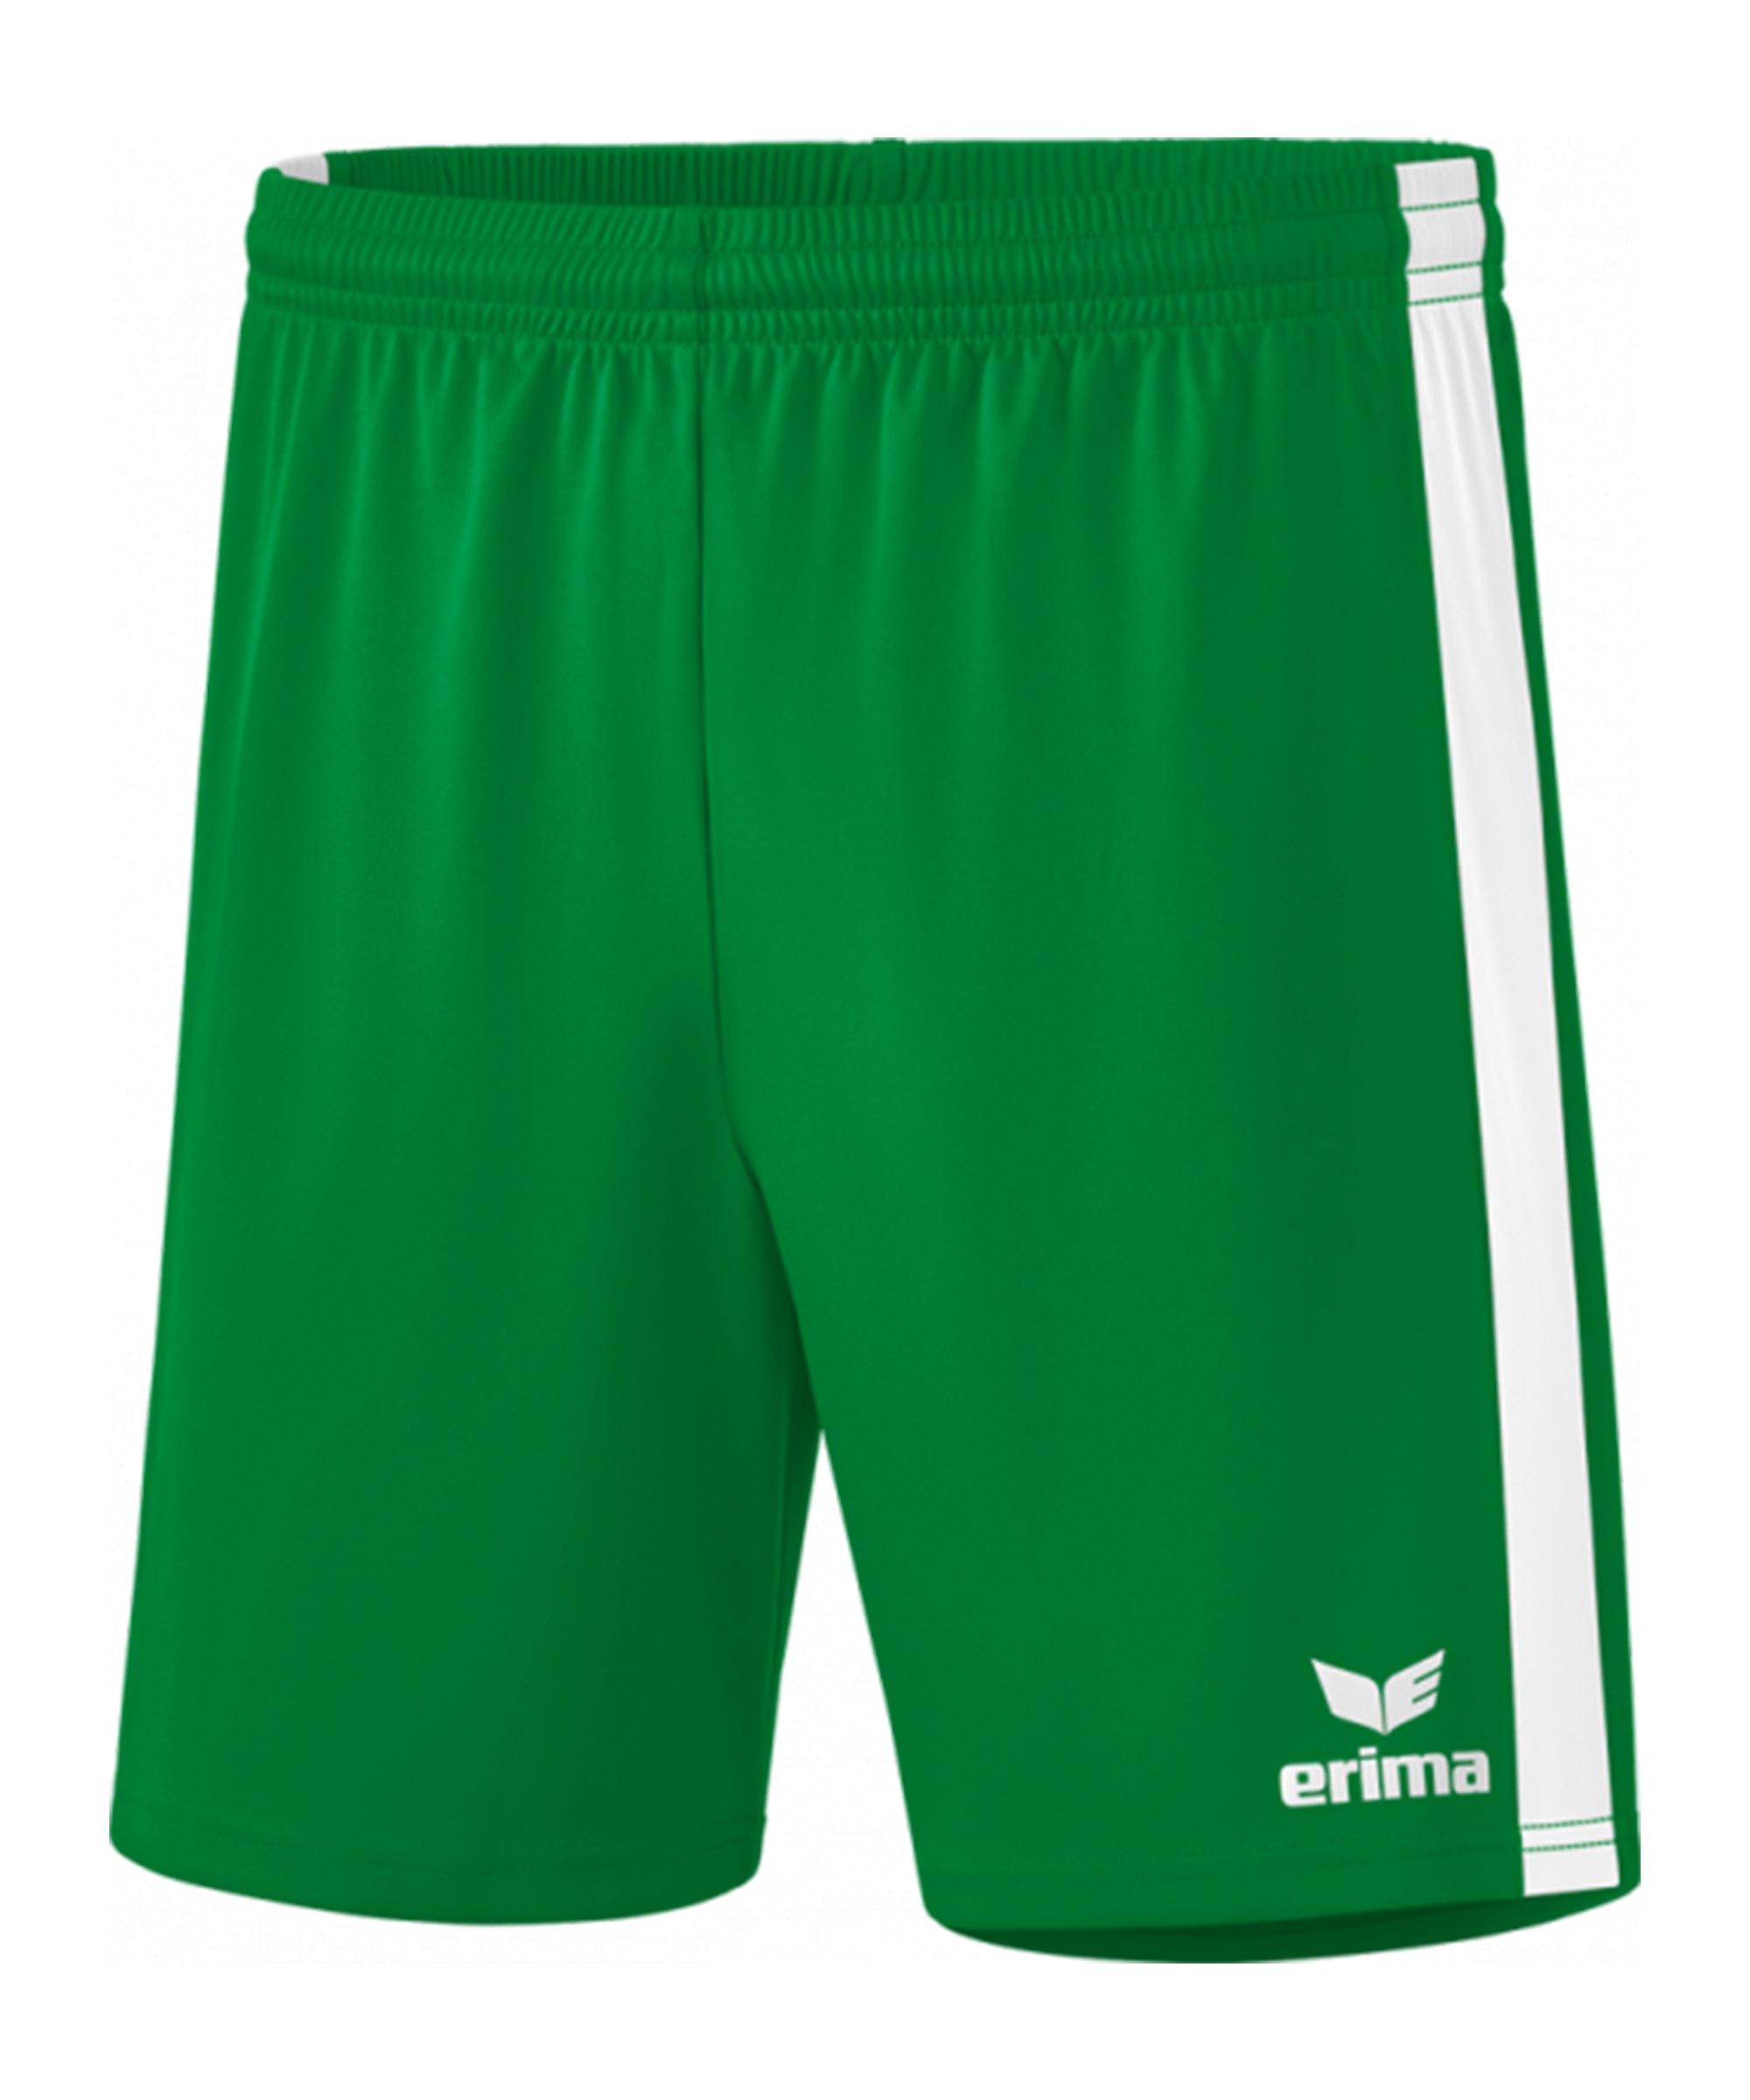 Erima Retro Star Shorts Kids Grün Weiss - gruen